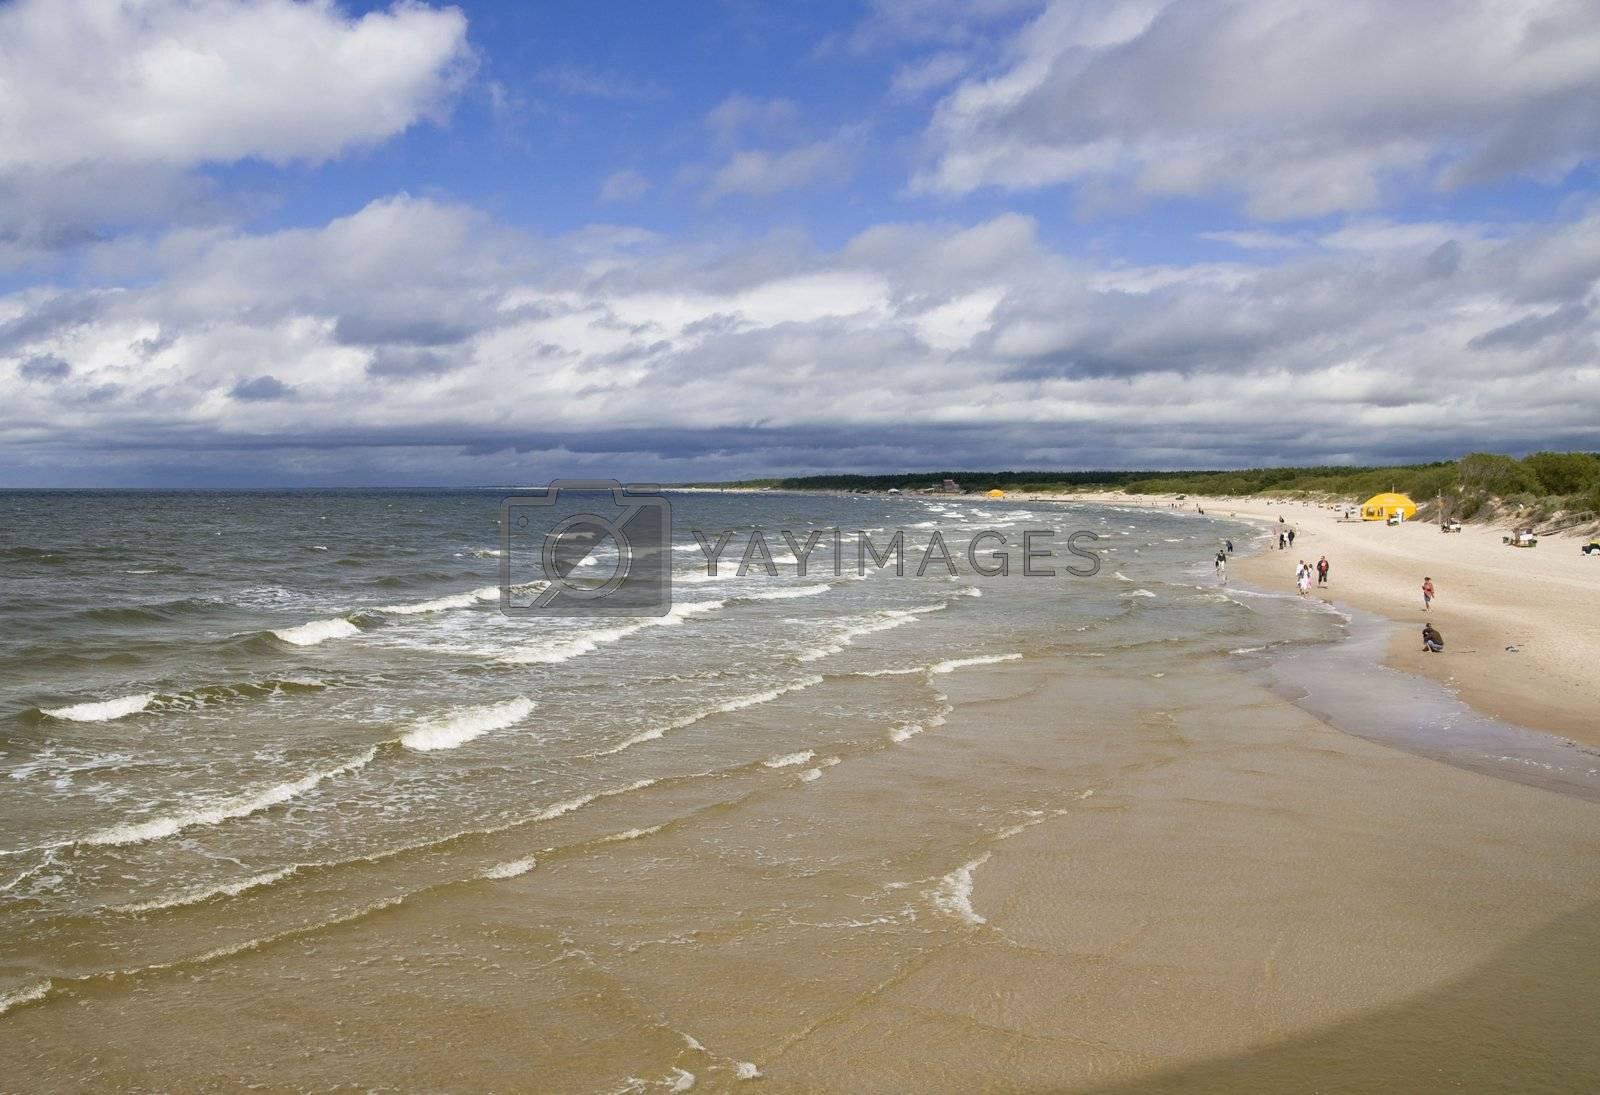 Royalty free image of Coast of the Baltic Sea by Nikonas